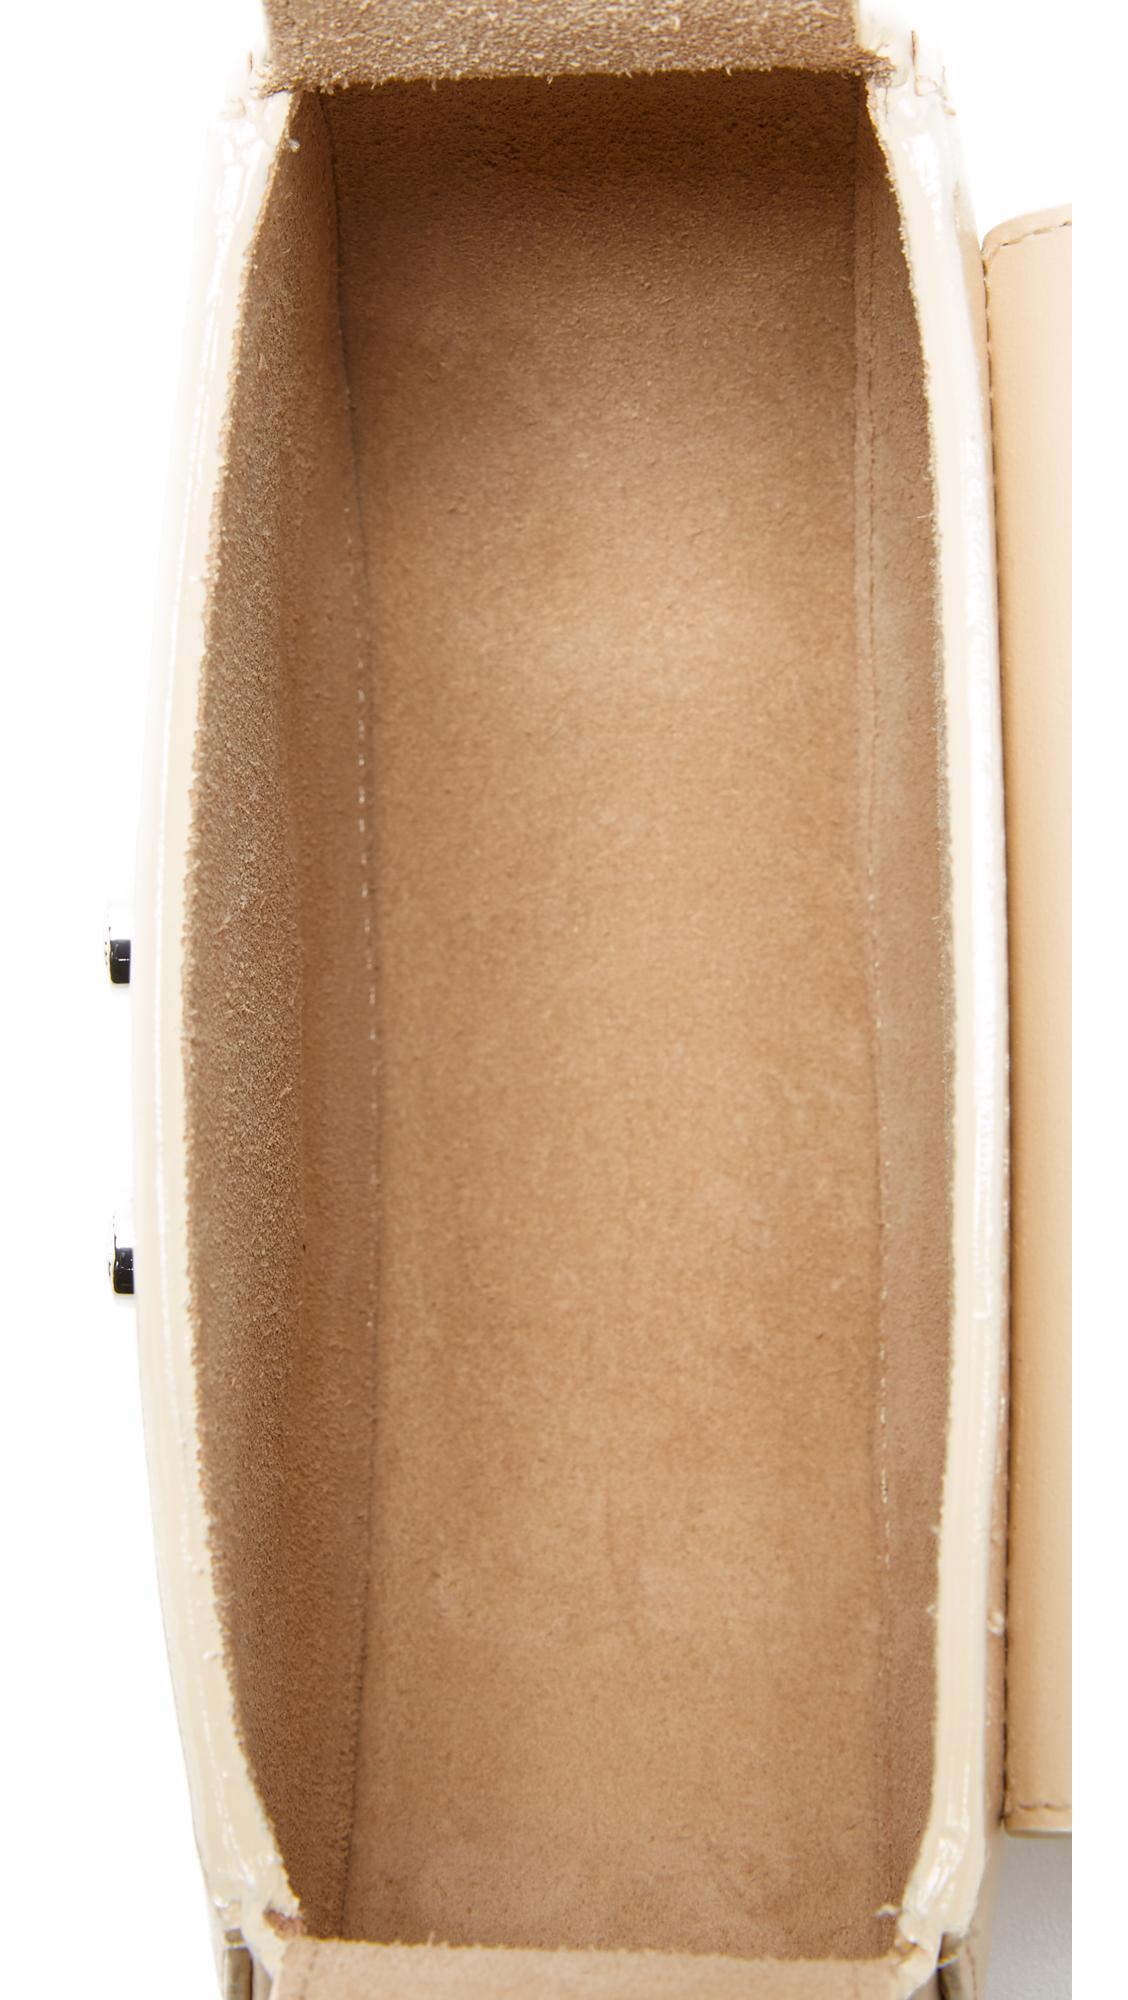 Salar Leather Mimi Cross Body Bag in Cream (Natural)